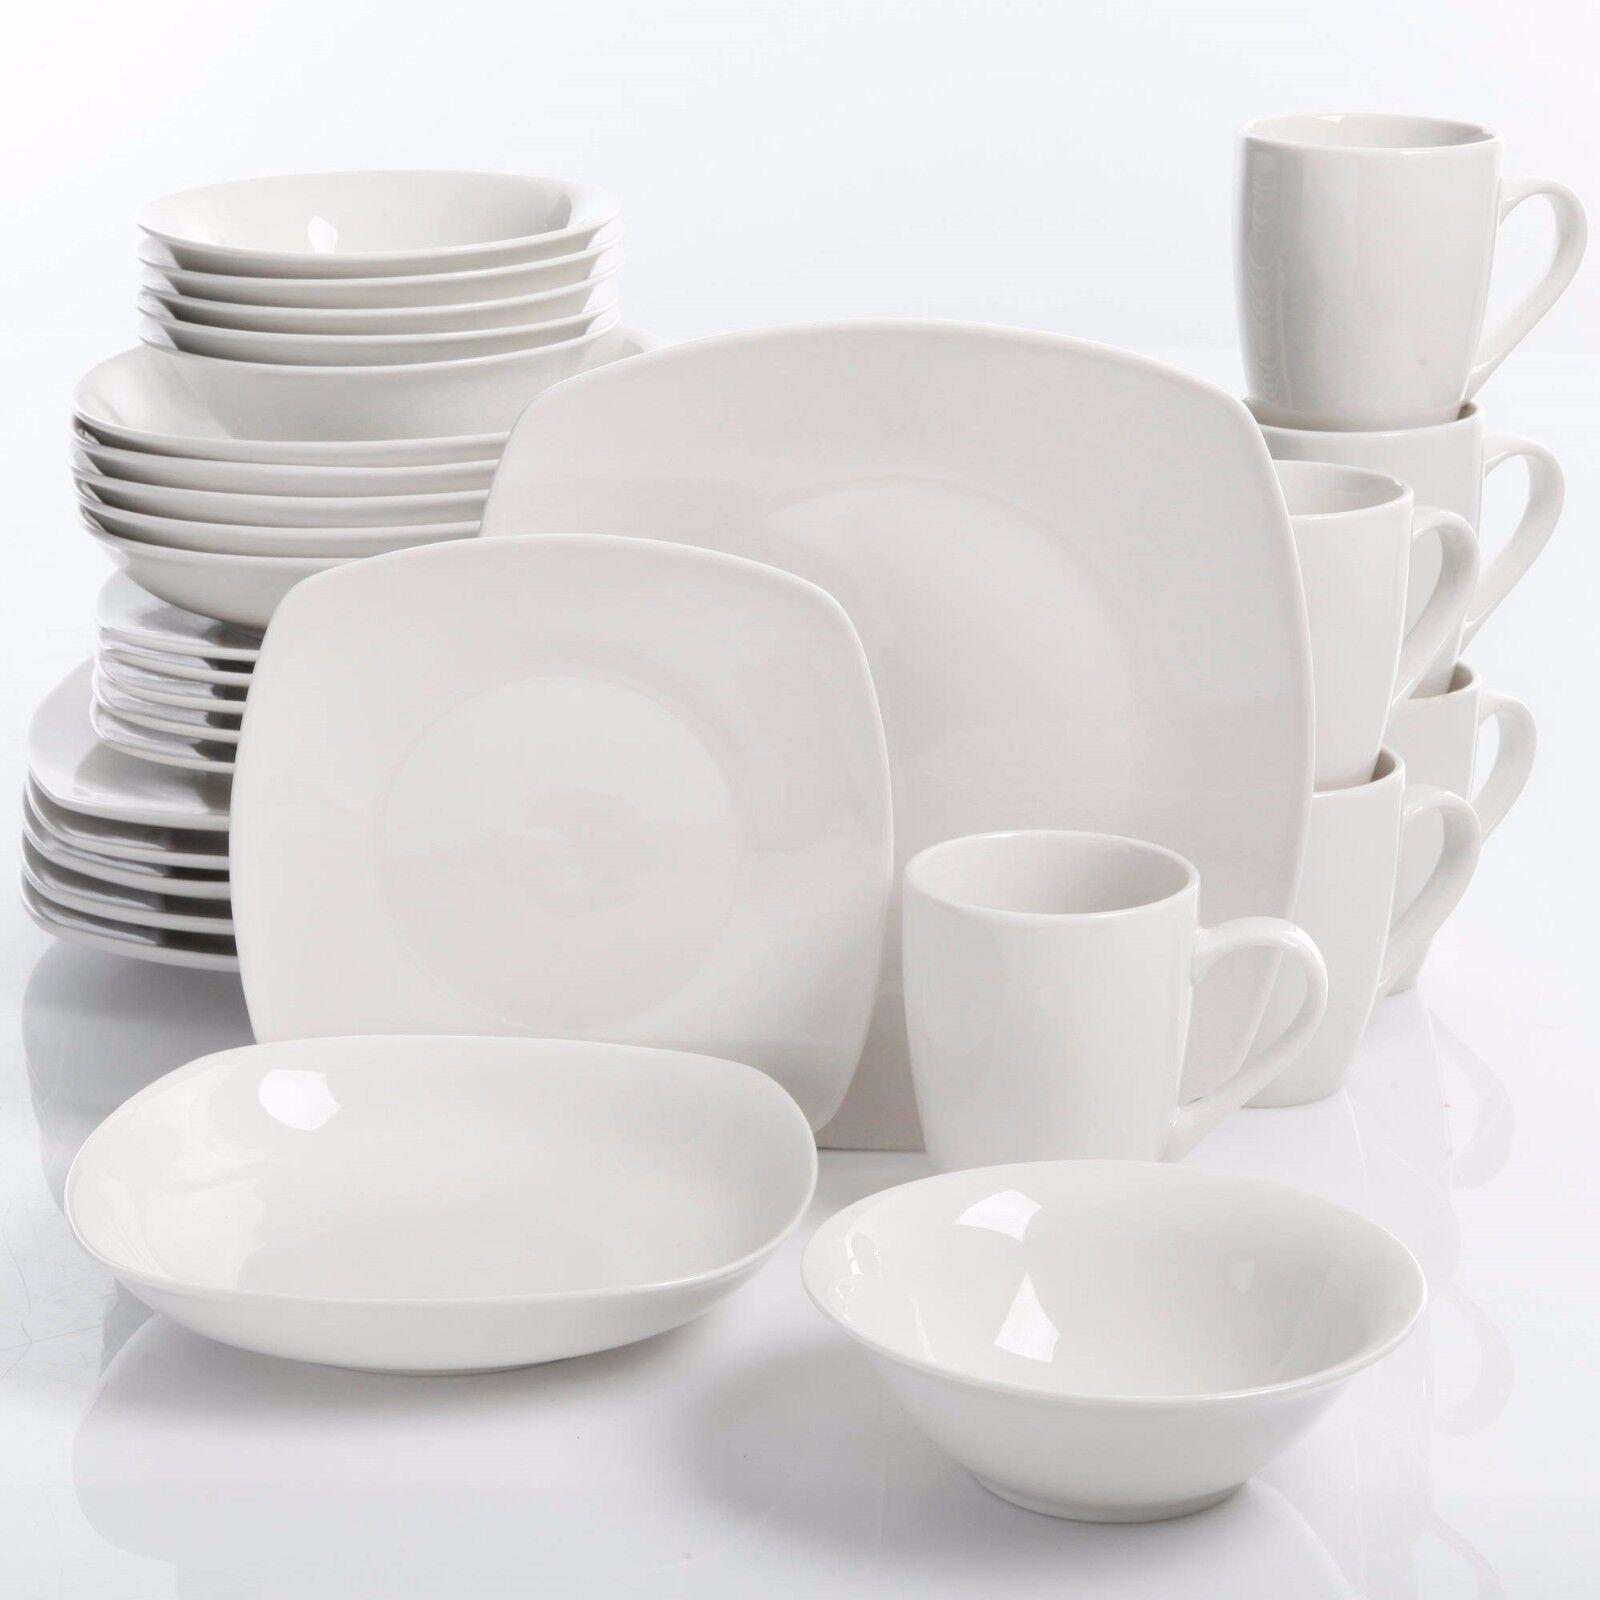 30-Piece Porcelain Dinnerware Set Square Dinner Plates Dish Service For 6 Weiß